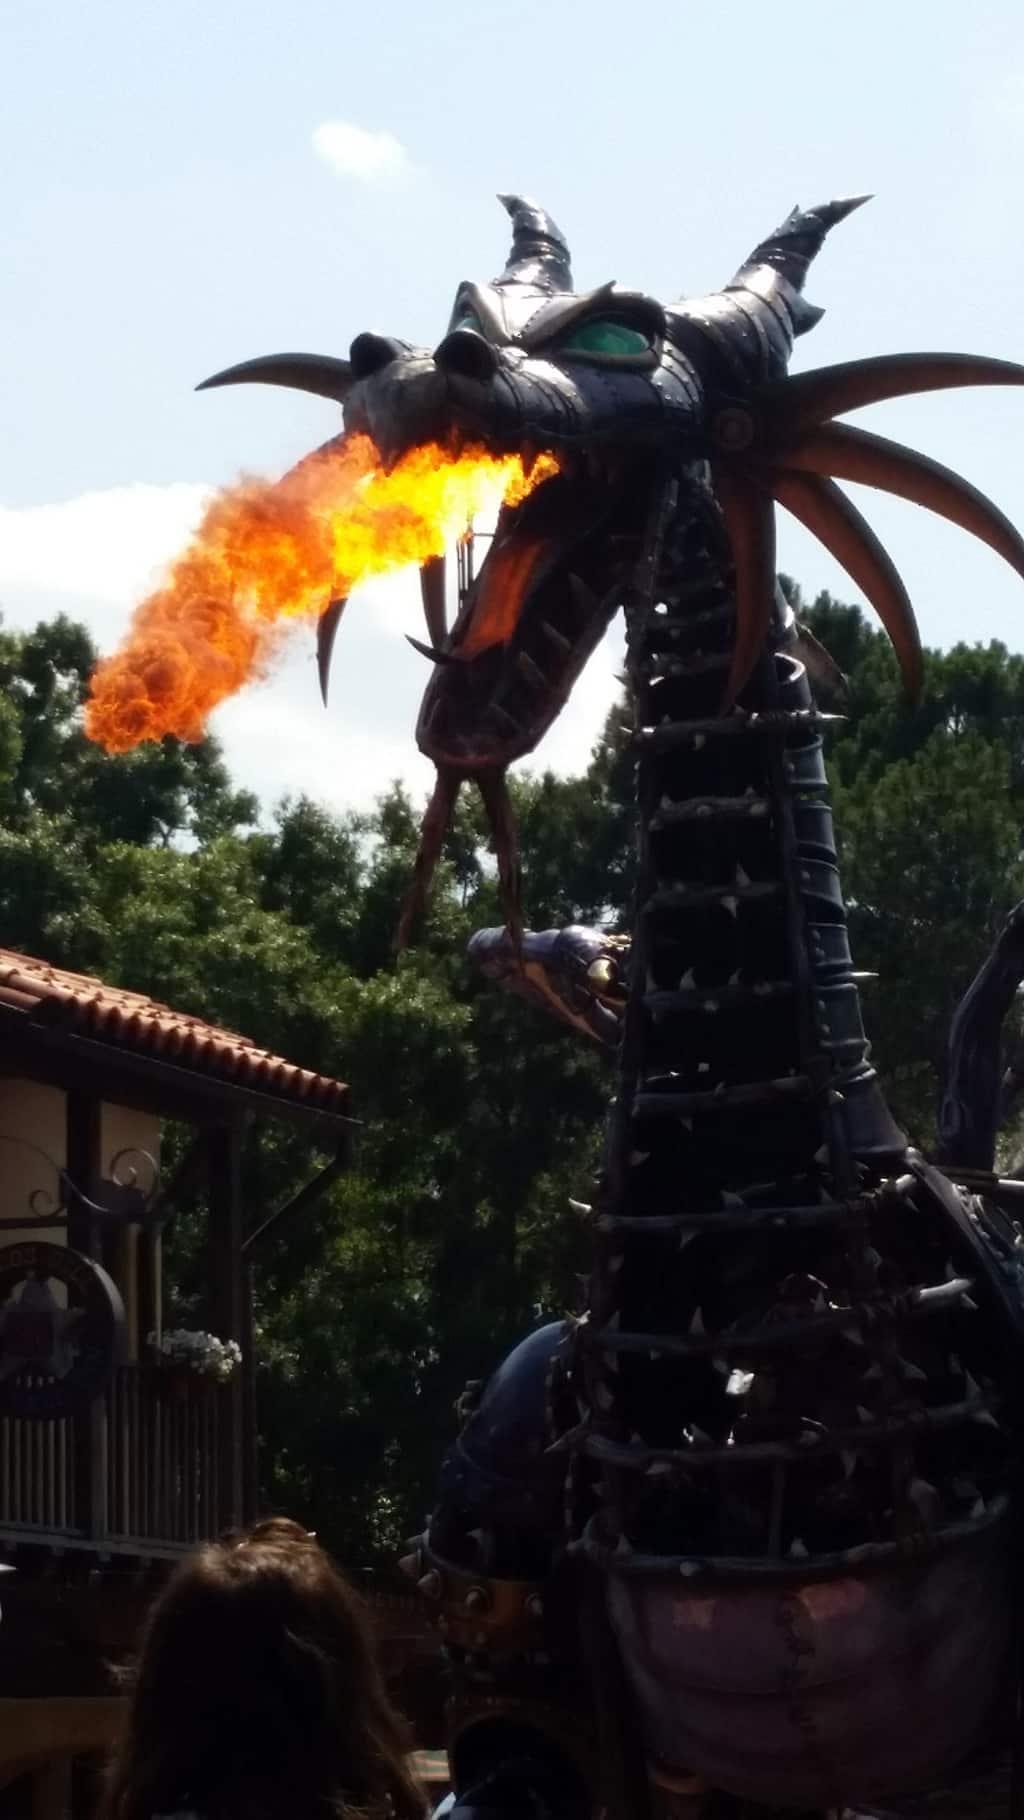 Dragon in Festival of Fantasy Parade in Magic Kingdom